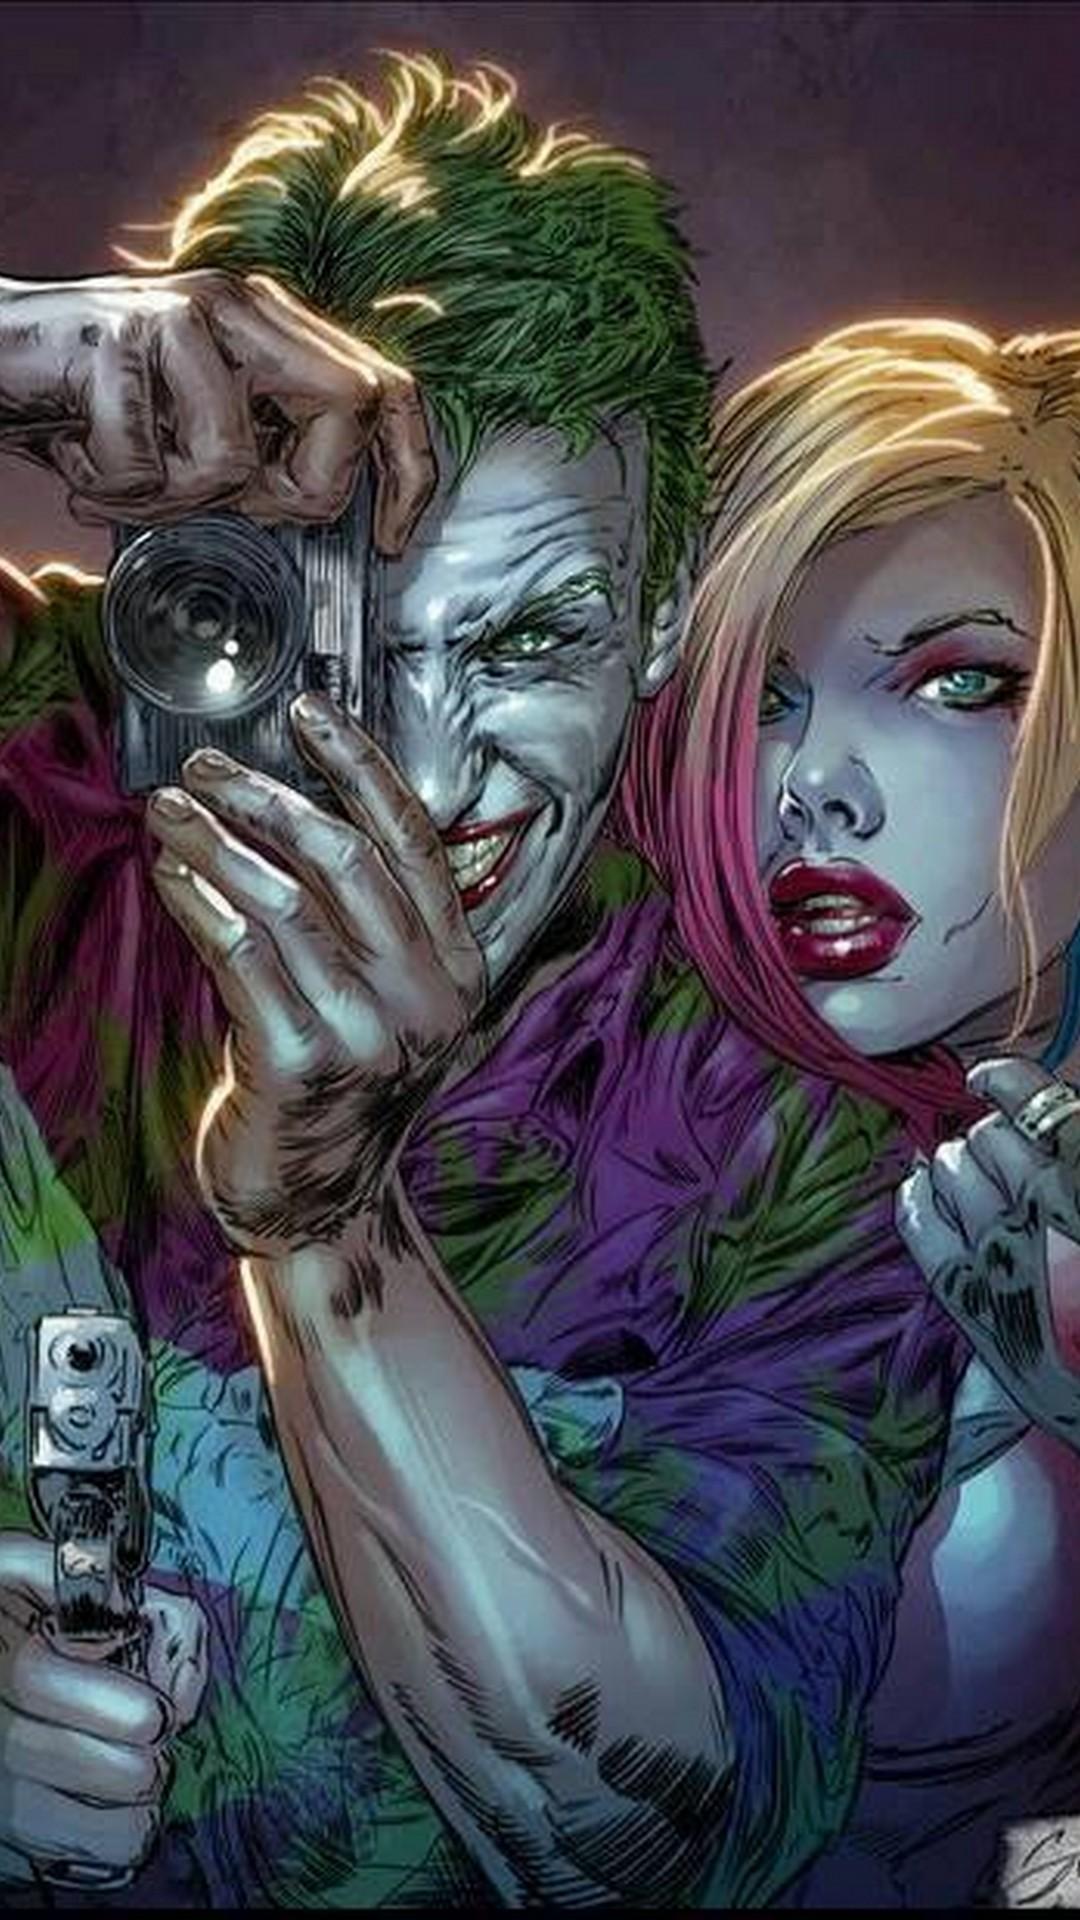 Free Joker And Harley Wallpaper IPhone 2019 3D